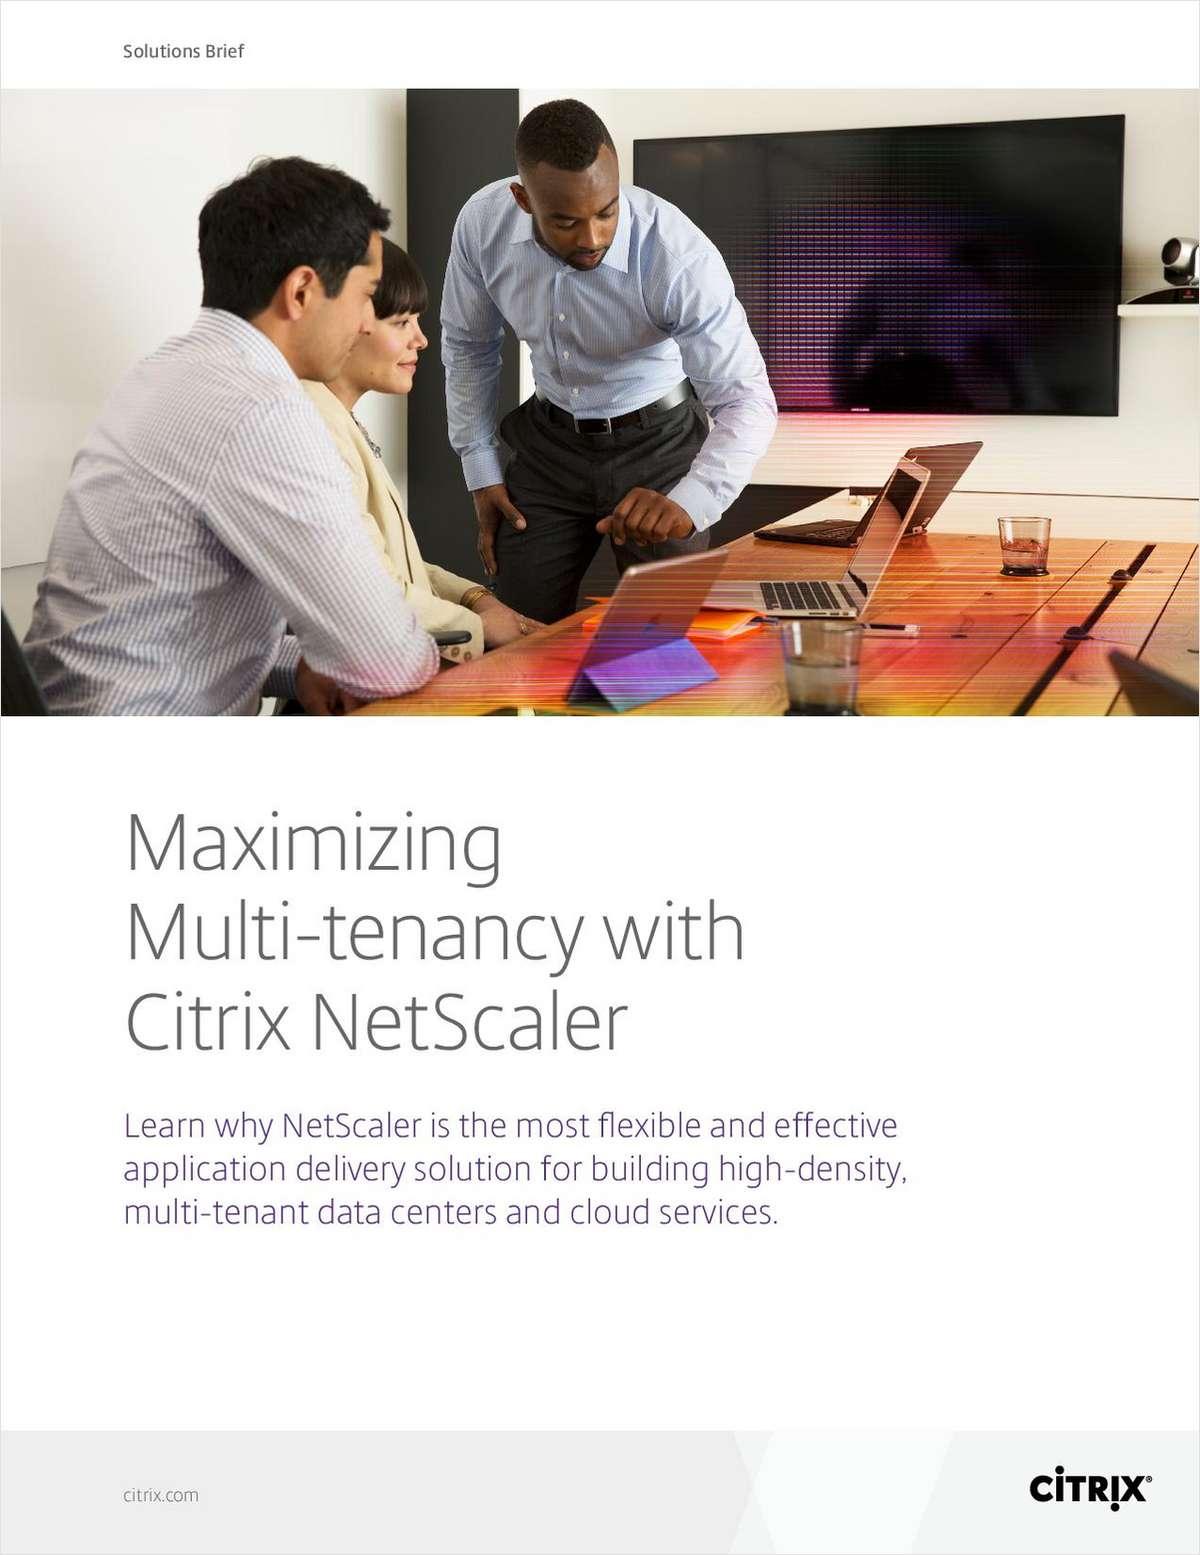 SDN 103: Maximizing Multi-Tenancy with Citrix NetScaler